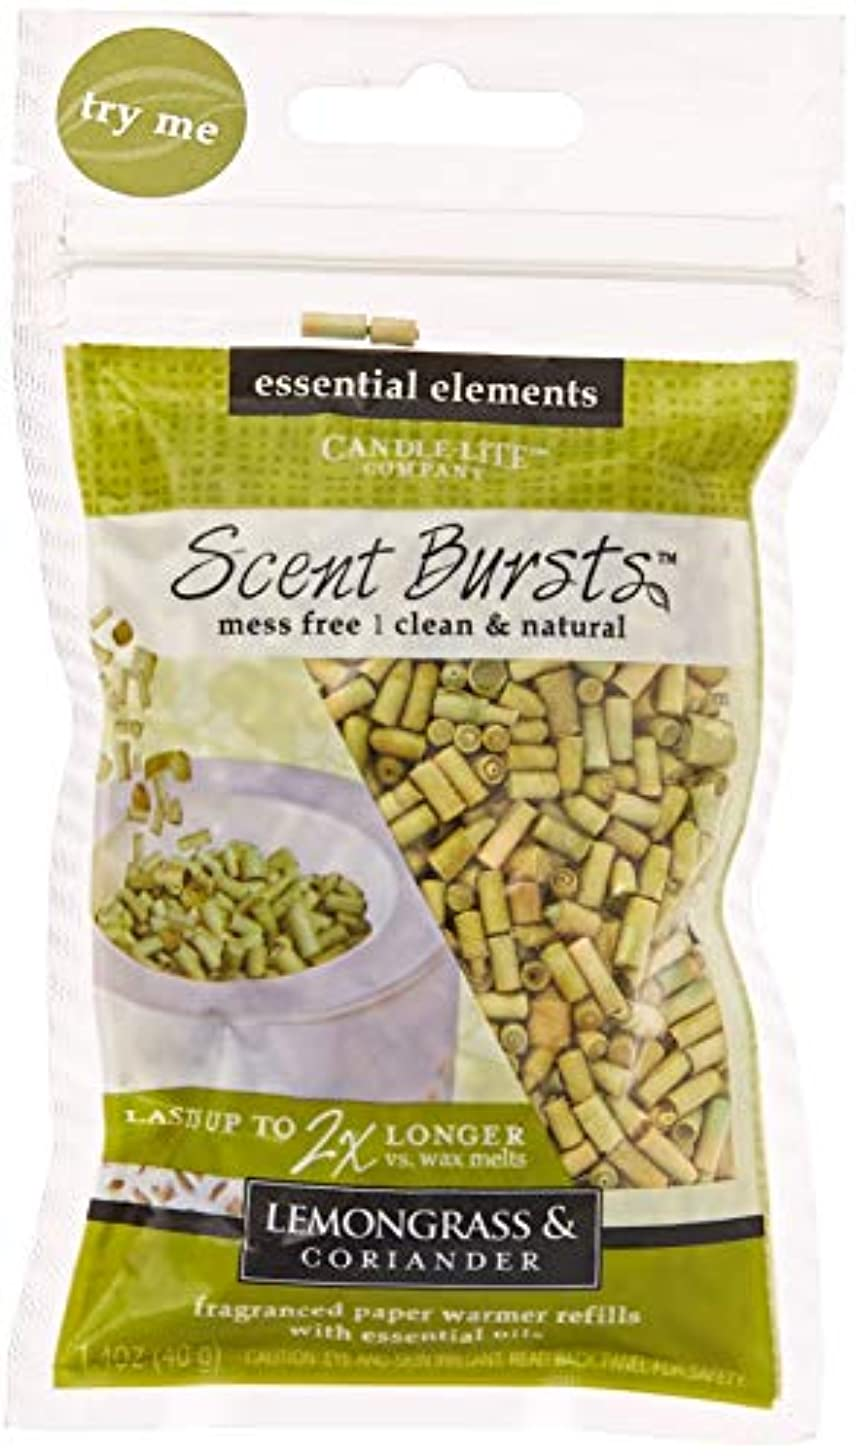 candle-lite Essential要素クリーン&ナチュラル香りバースト用紙Warmer Refillsより2 x長持ちワックス Lemongrass & Coriander 4 Pack グリーン